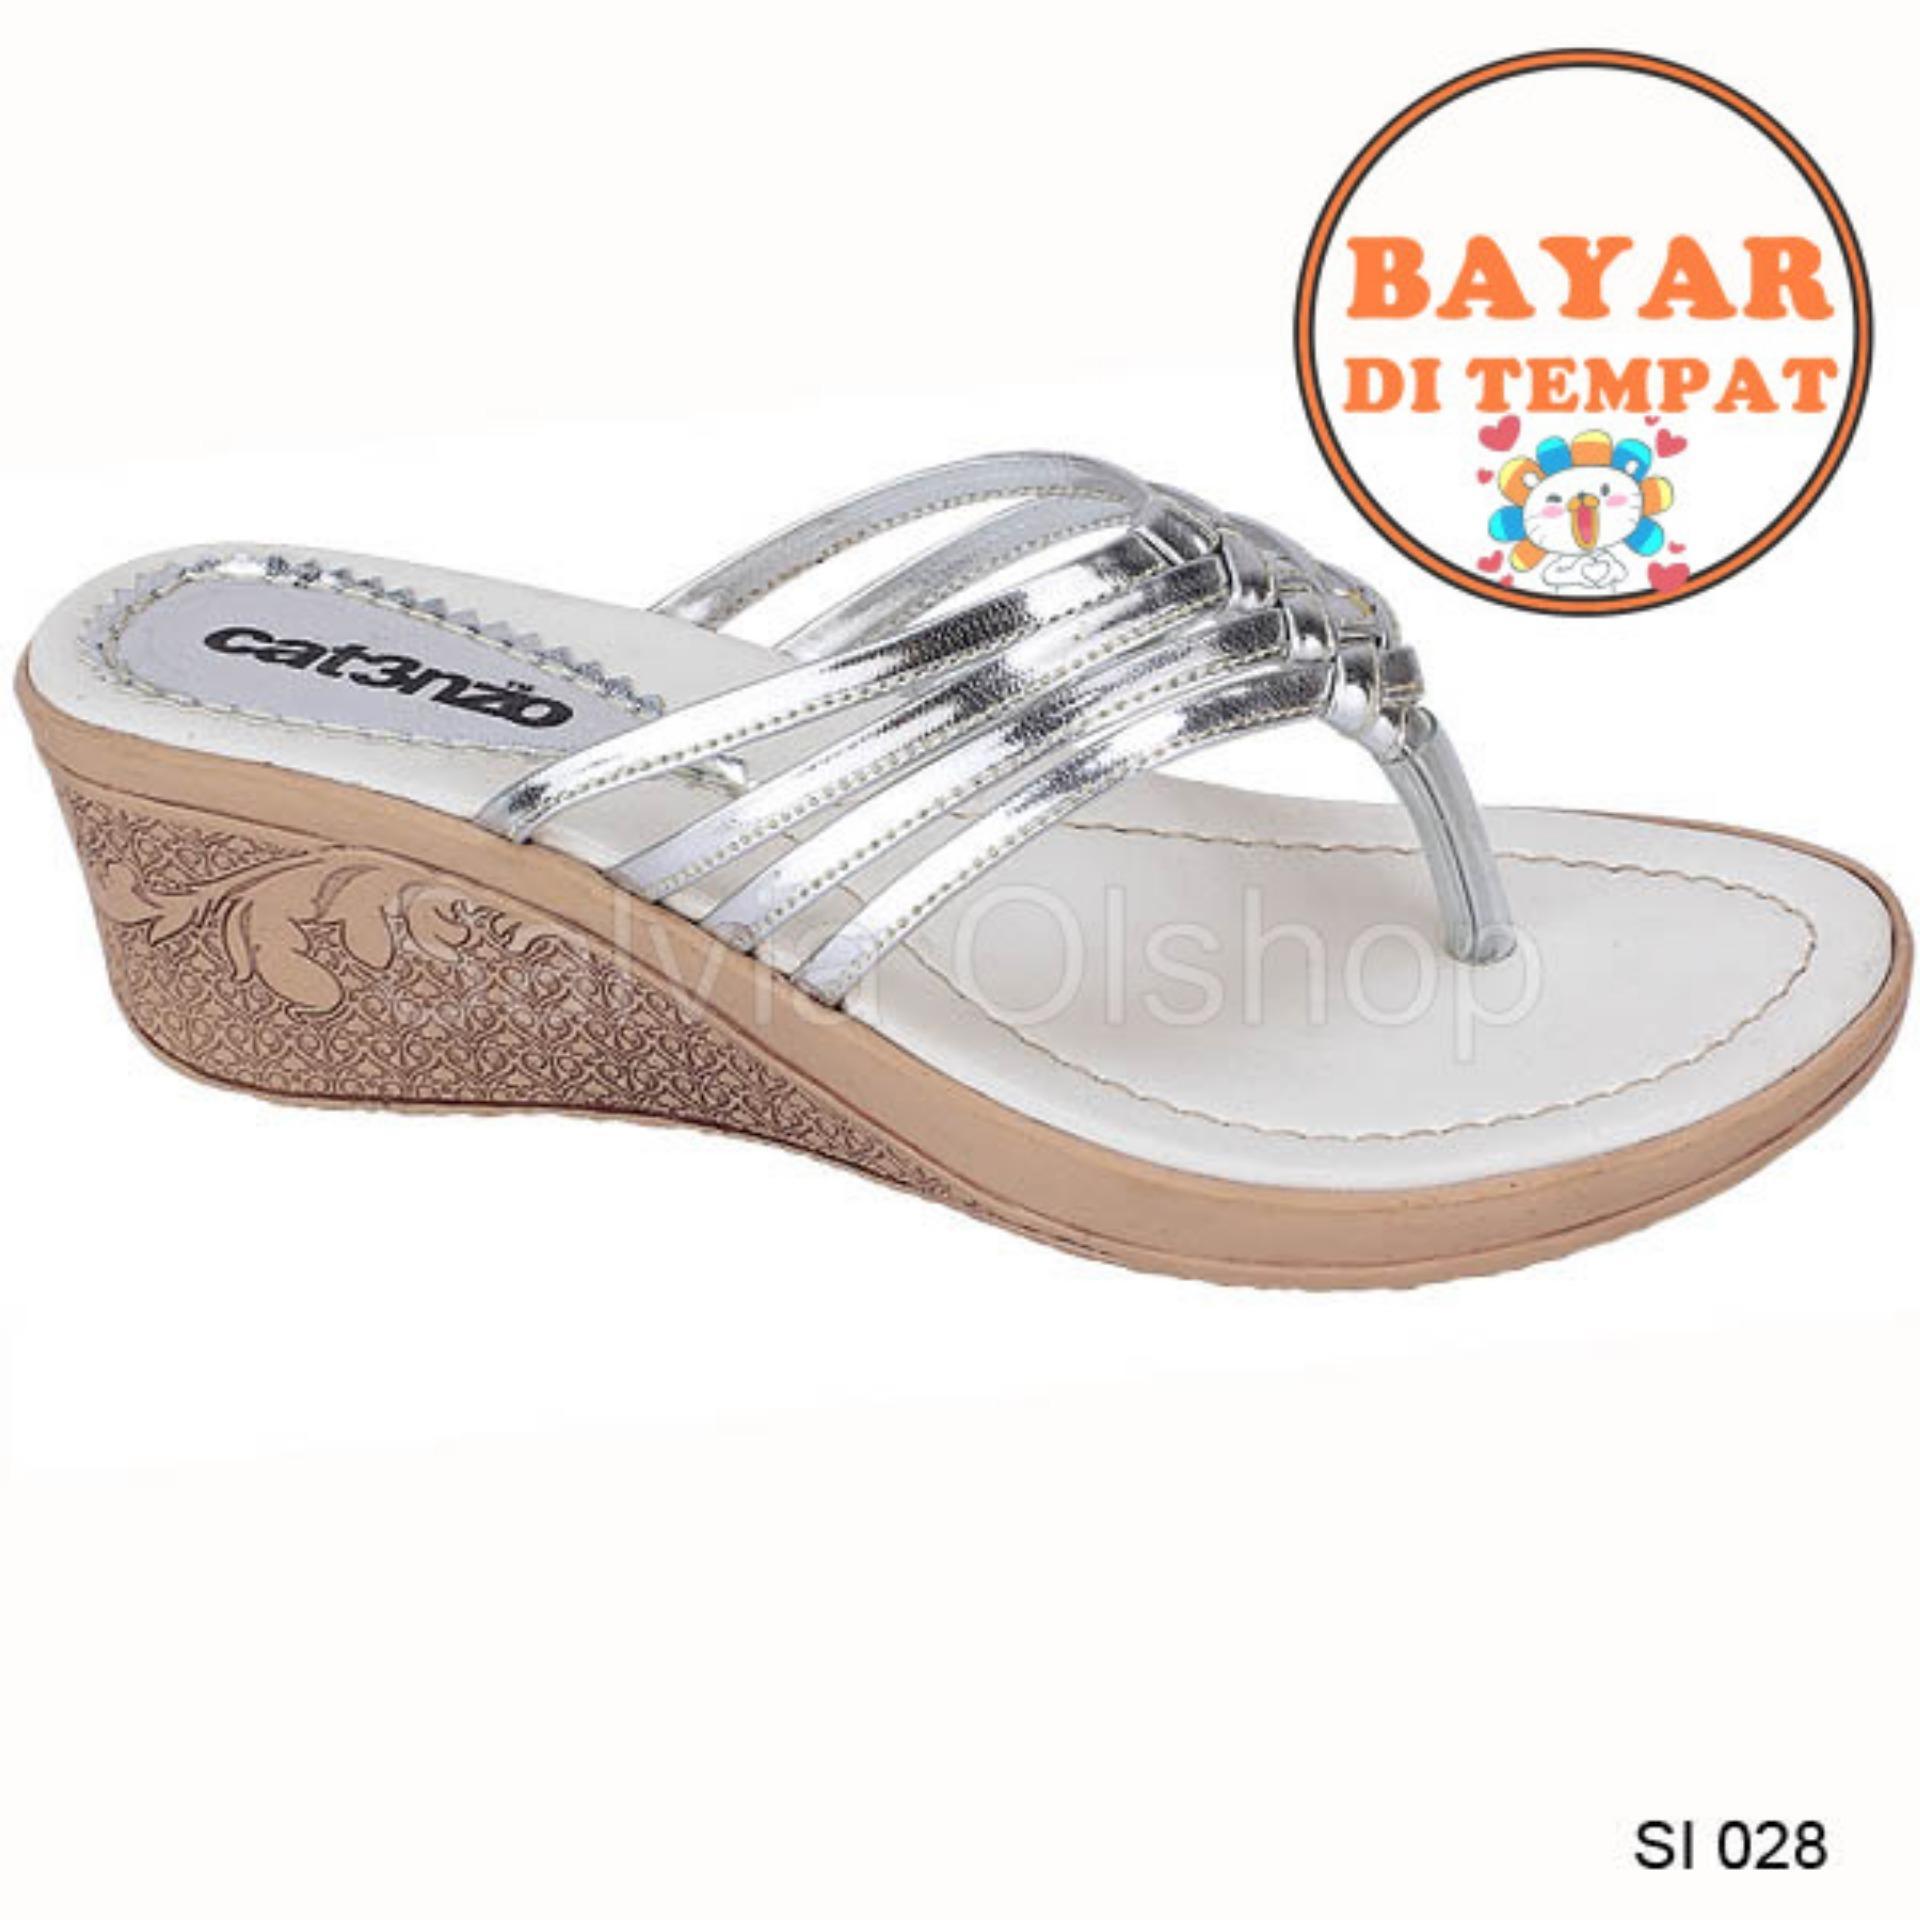 Catenzo Sandal Flat / Selop Wanita Cantik Dan Modis SI 028 - Perak